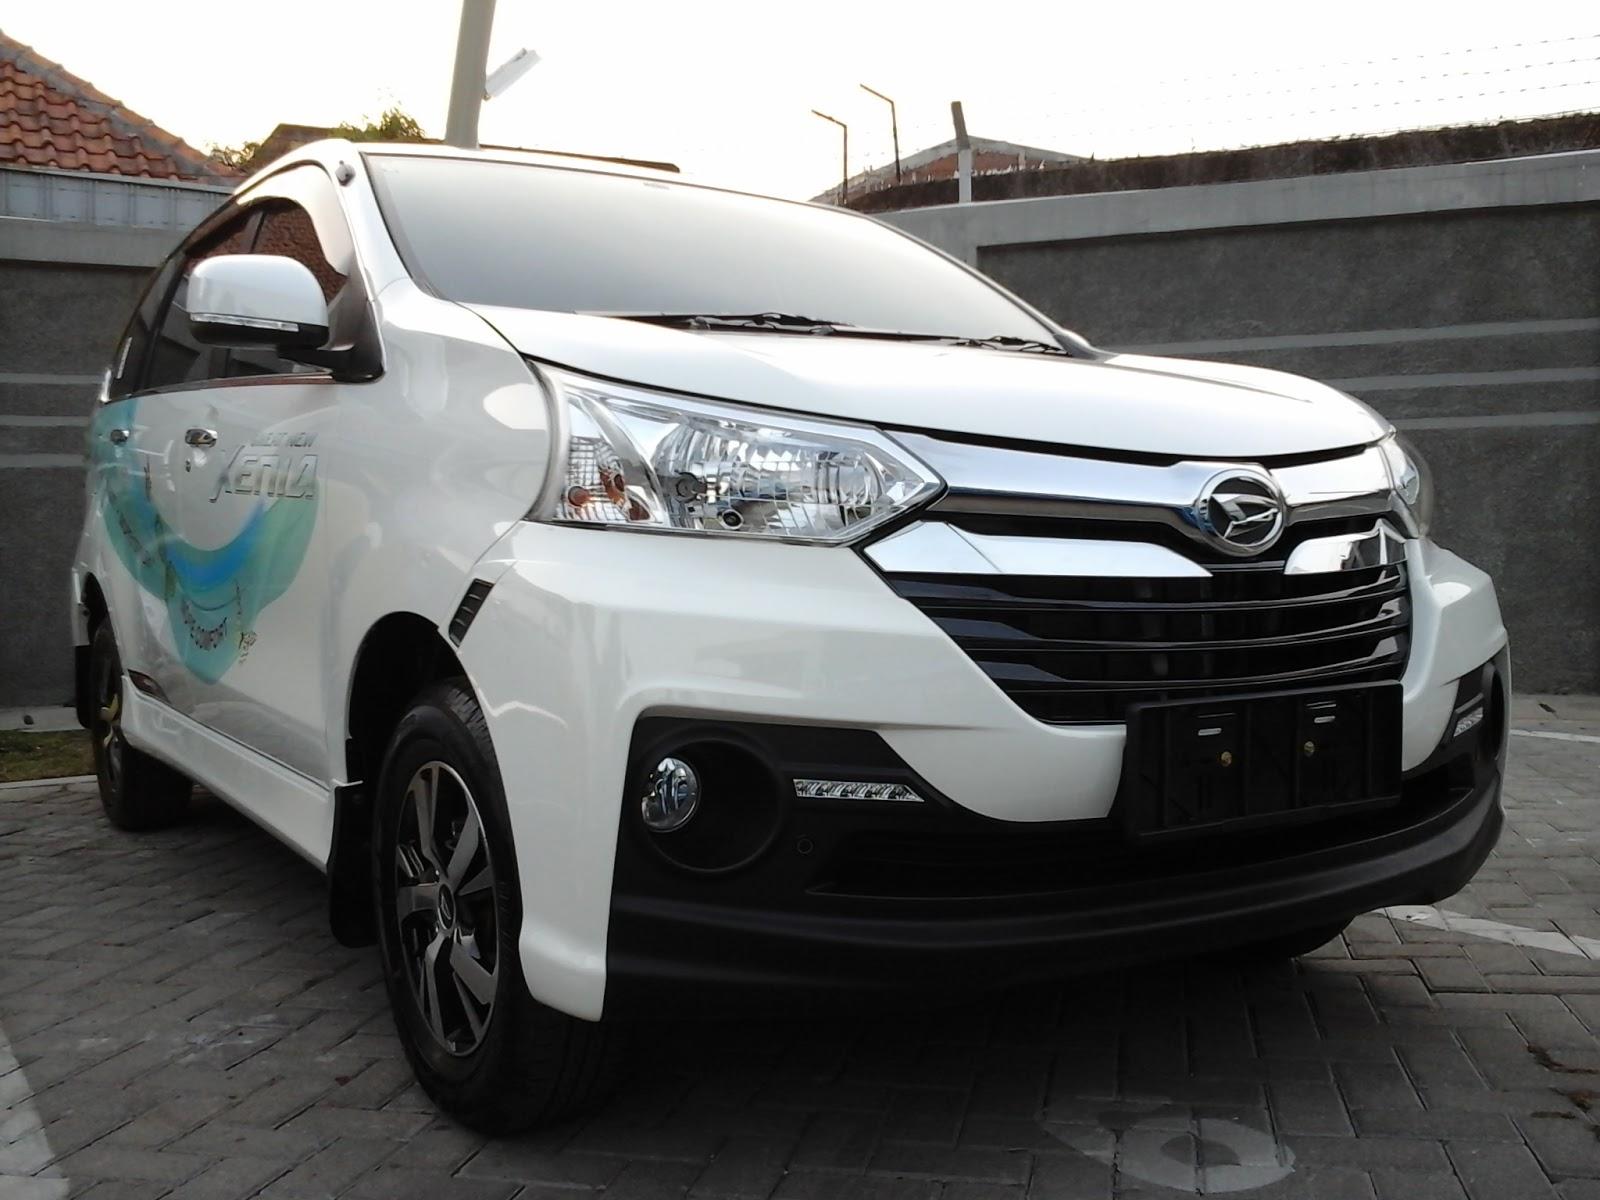 Kumpulan Modifikasi Mobil Xenia R Sporty